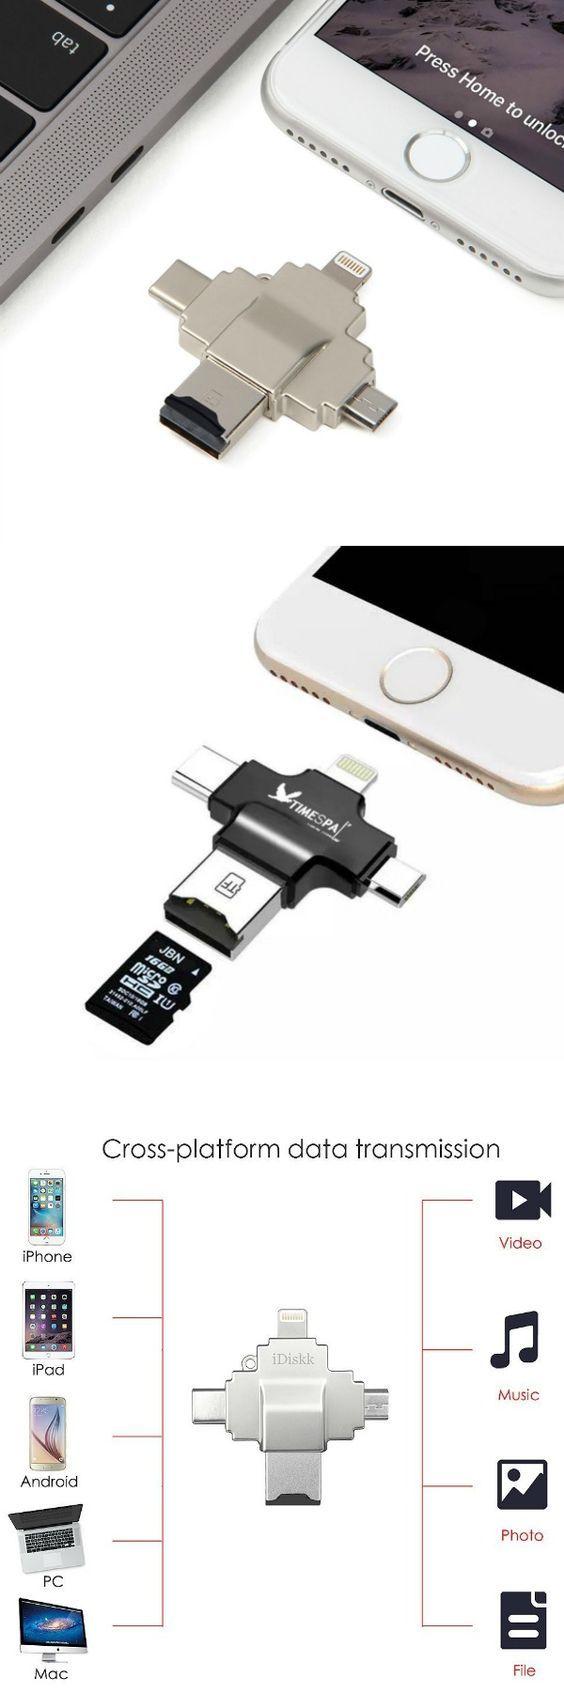 iDiskk High-Speed Flash Drive and Card Reader with Lightning&USB-C&Micro-USB Ports For iPhone, iPad, Galaxy, Nexus 5x6p, Pixel, Chromebook, Macbook Pro @aegisgears